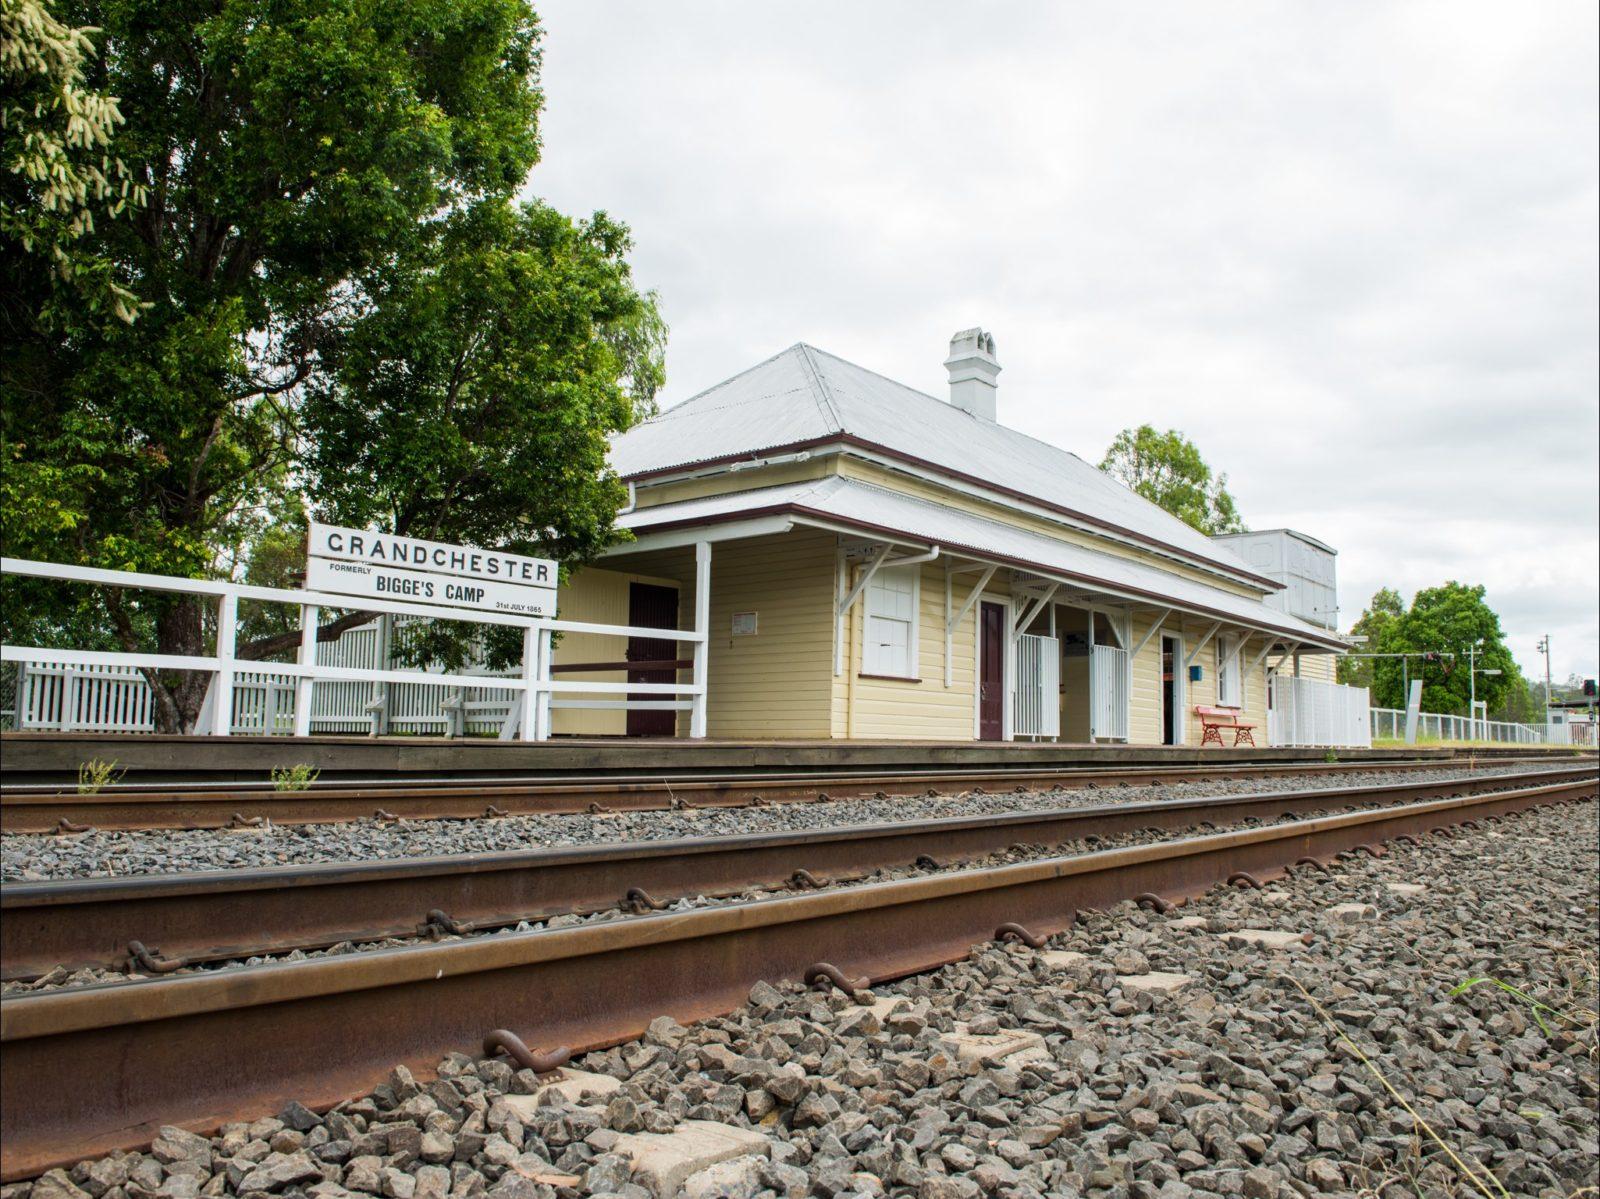 Grandchester Train Station